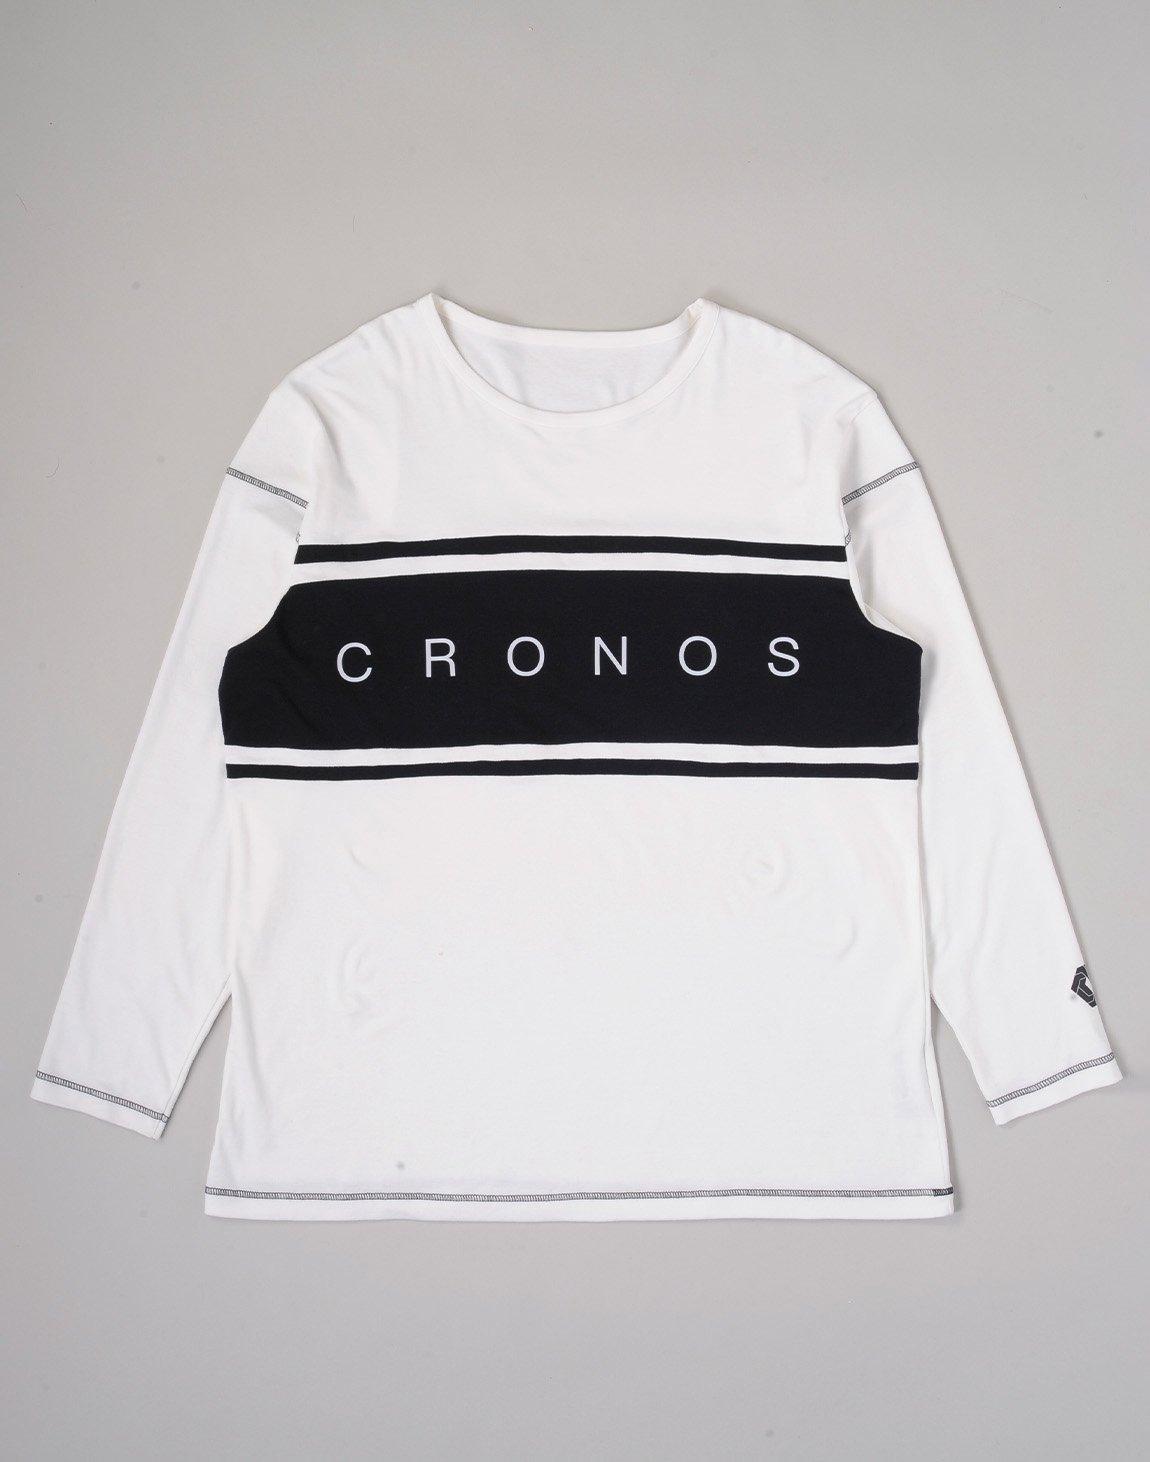 CRONOS BANNER LOGO BIG LONG SLEEVE【WHITE】